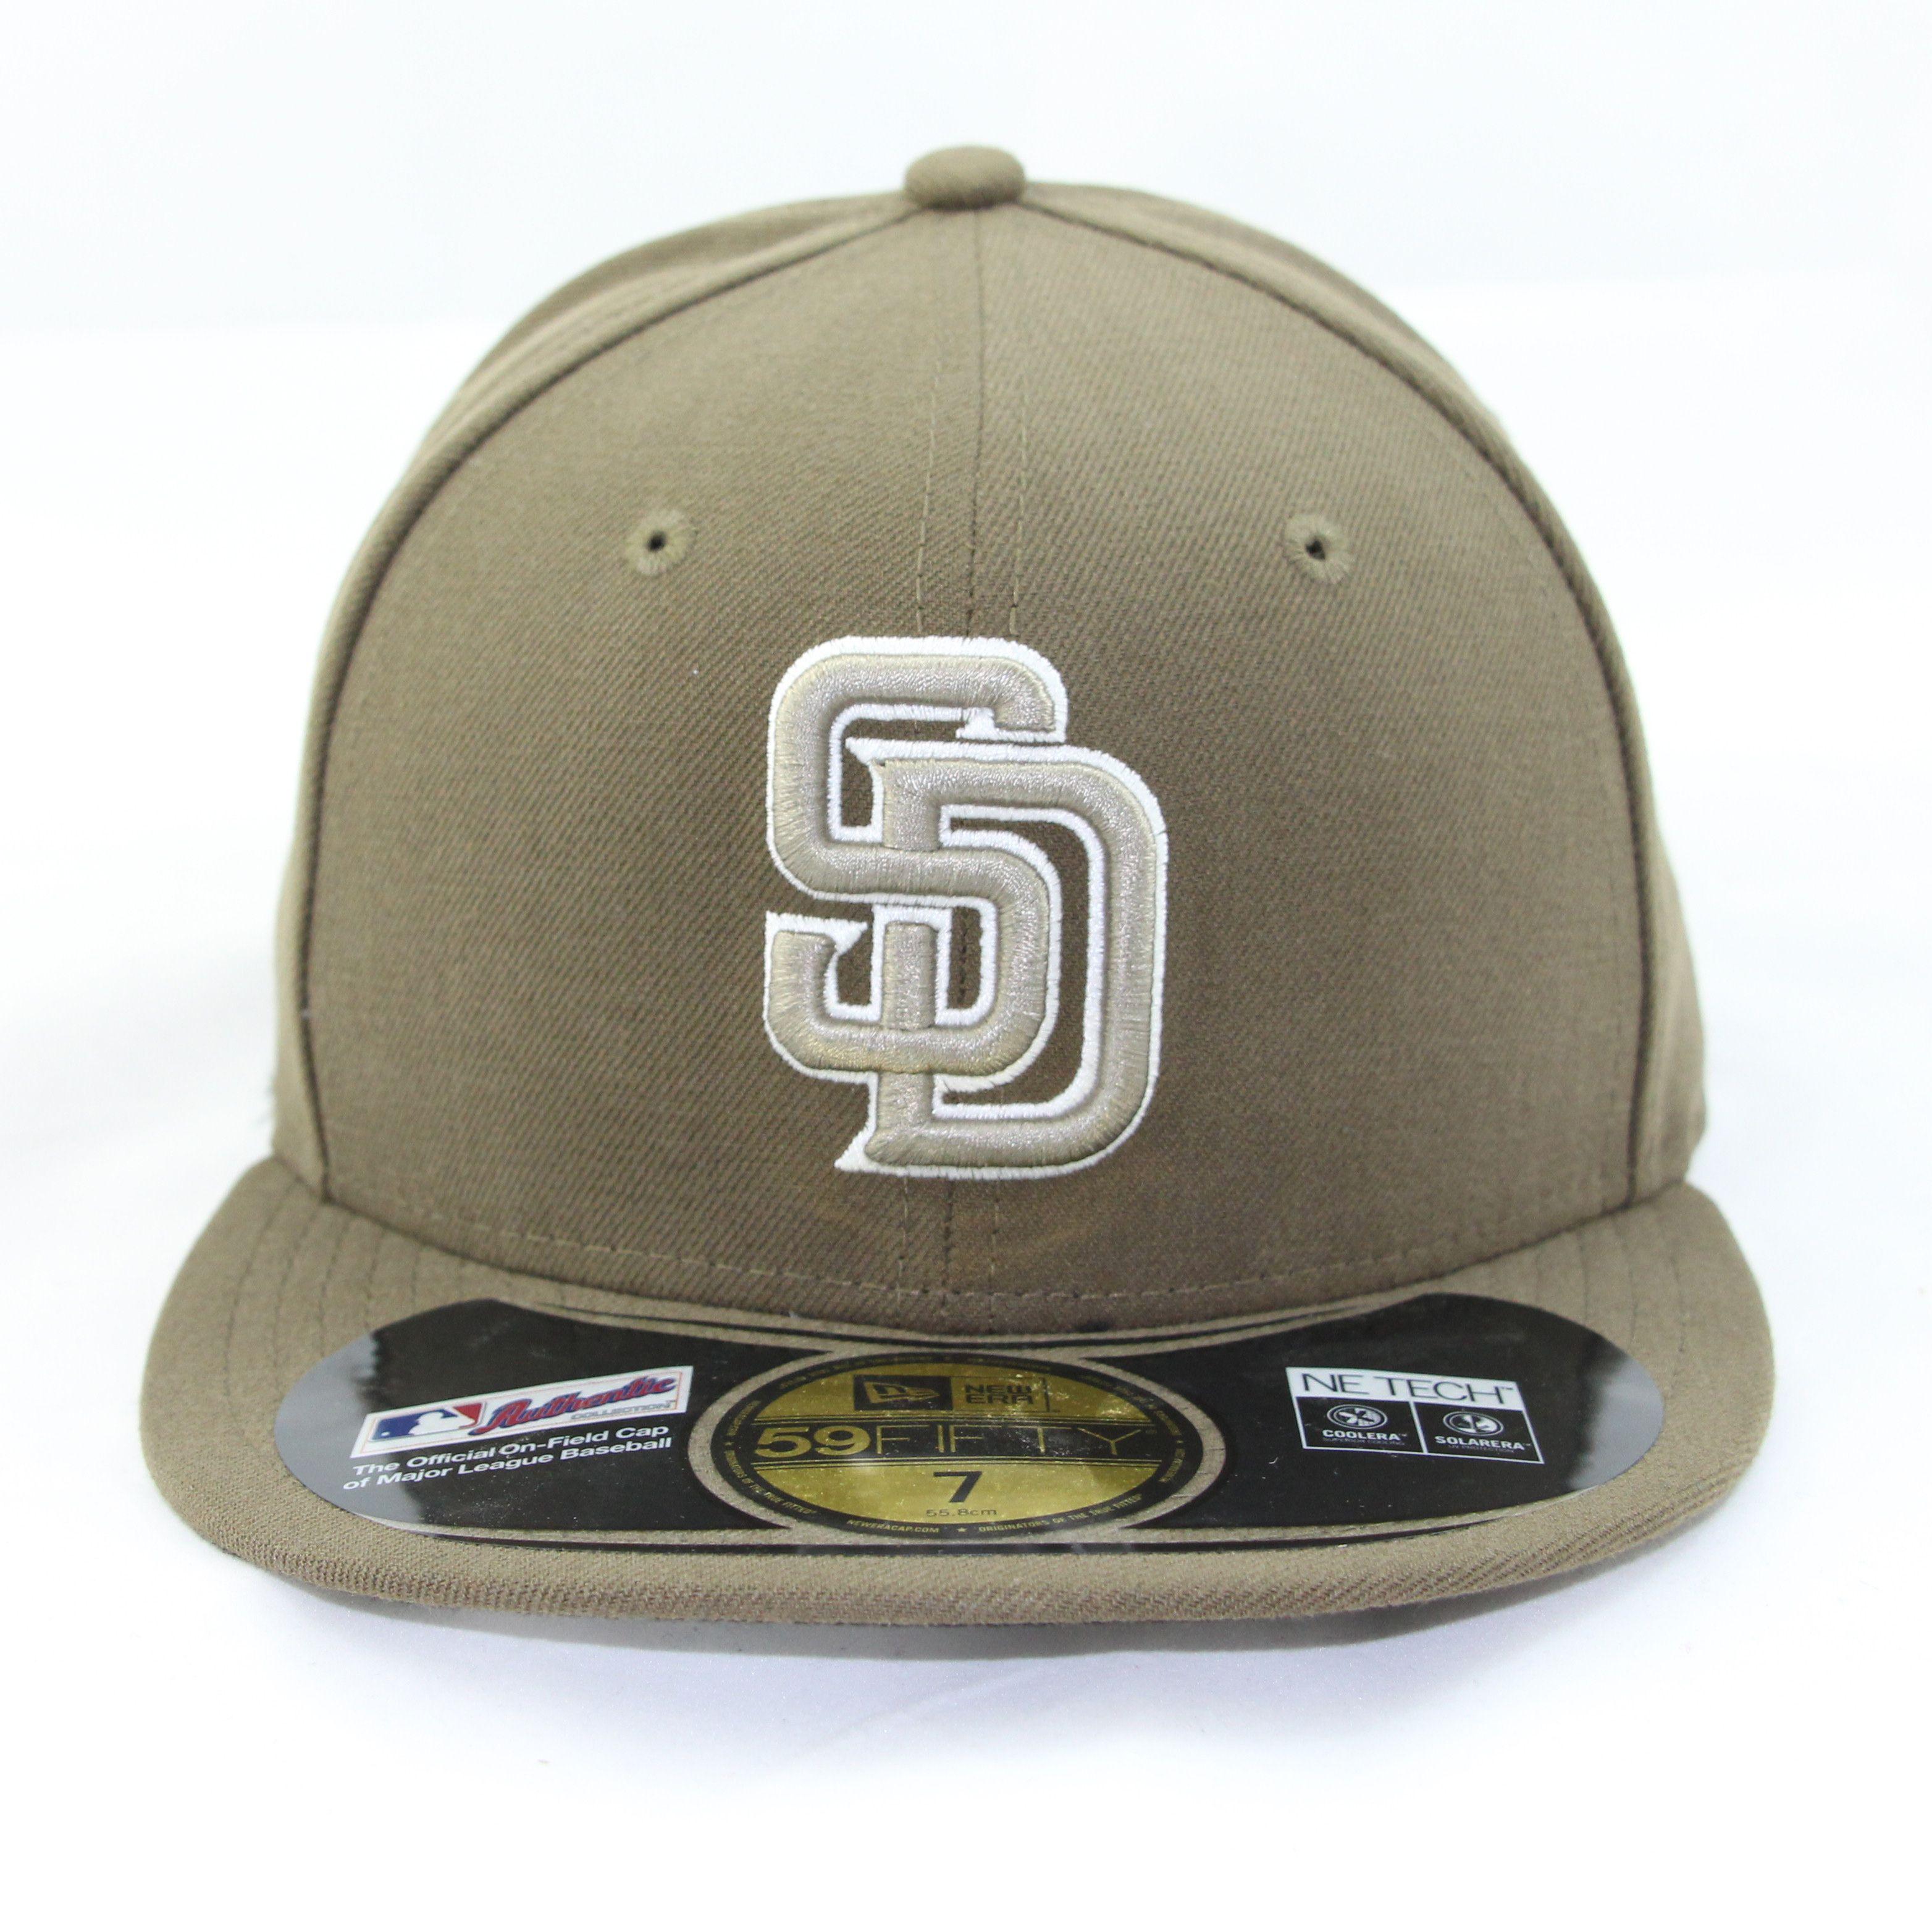 Gorras Originales New Era Beisbol San Diego Padres 59fifty -   569.00 5d14f3ab4a4